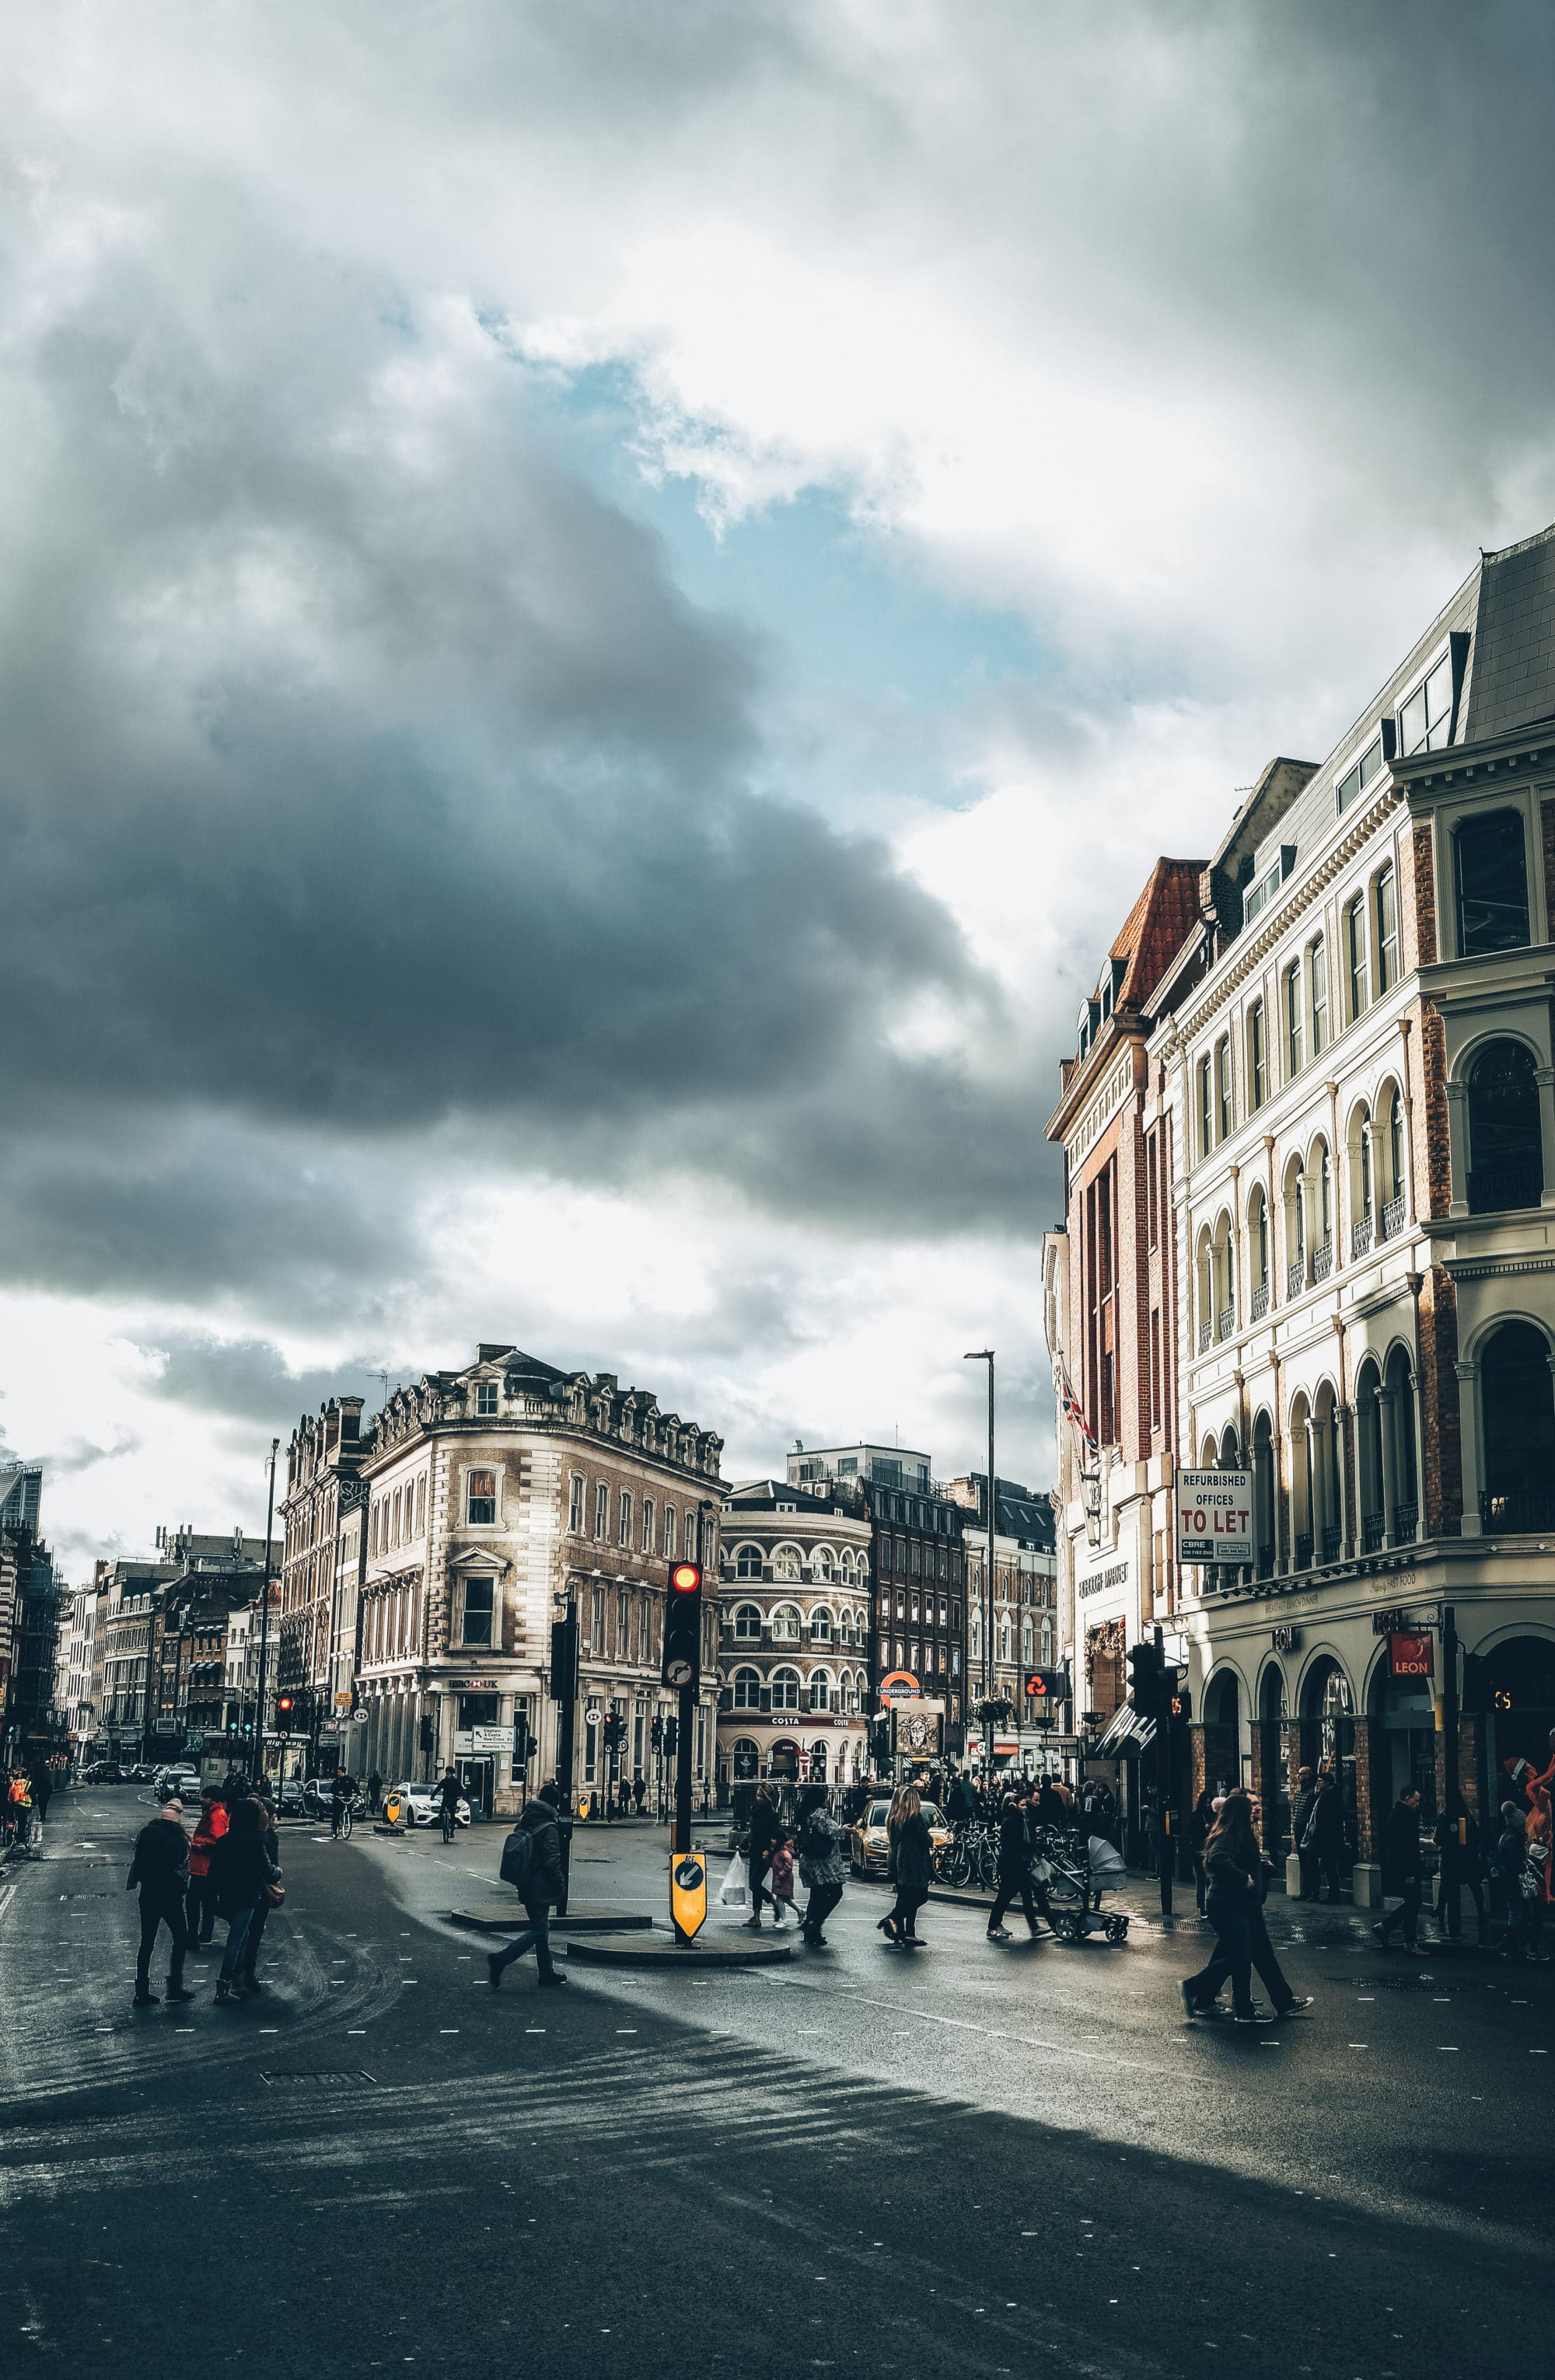 Londres eurostar weekend